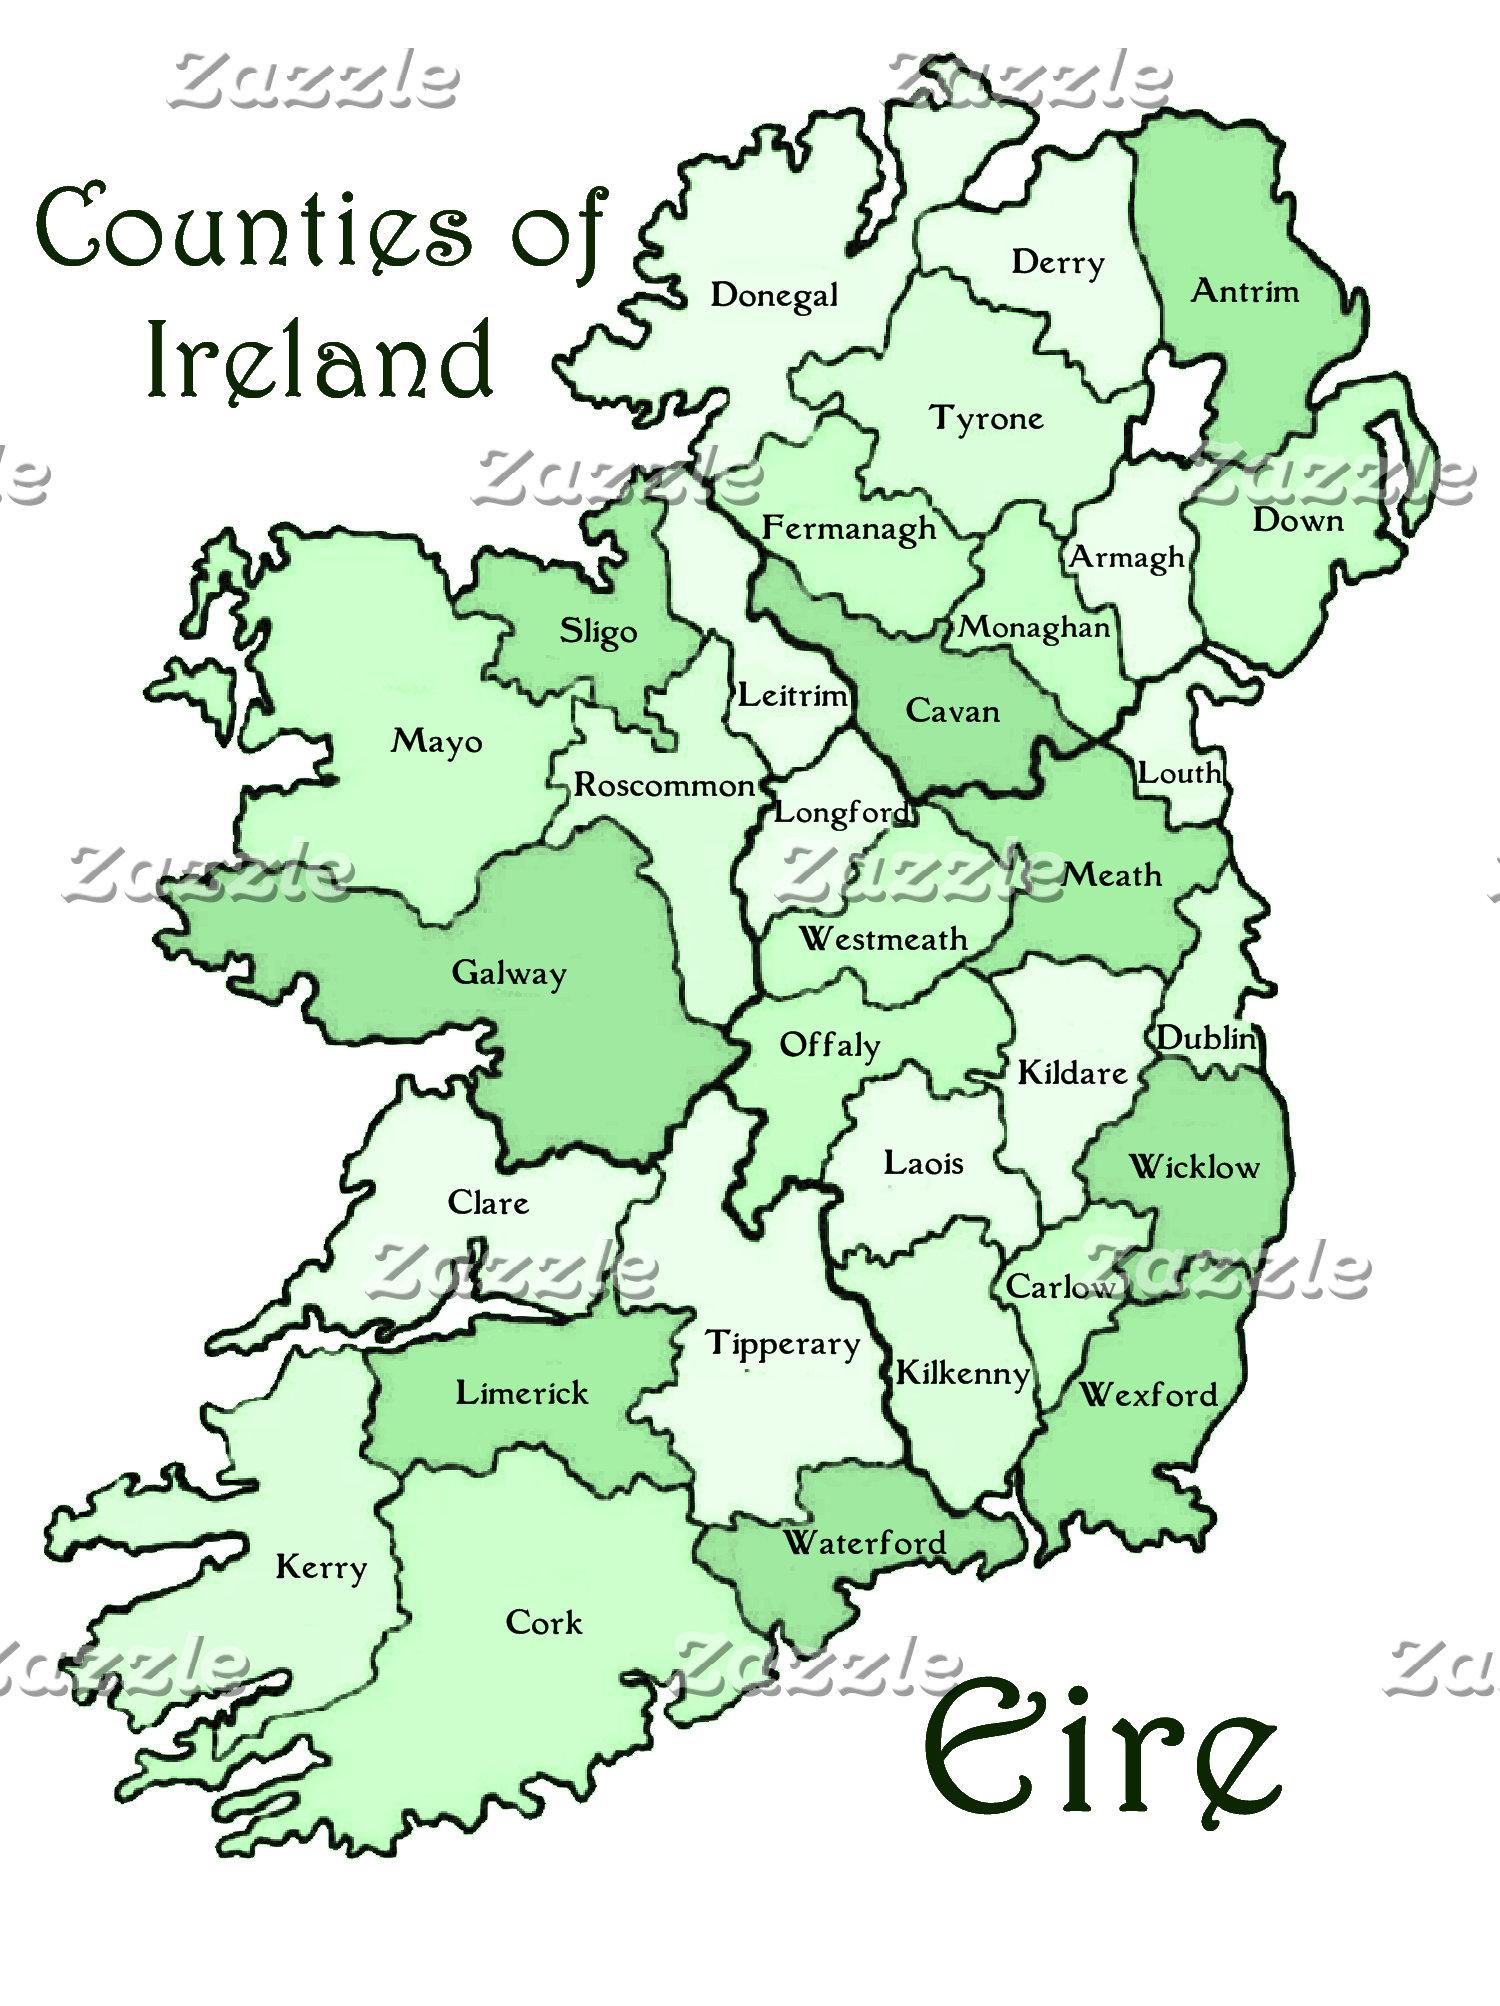 Counties of Ireland Map